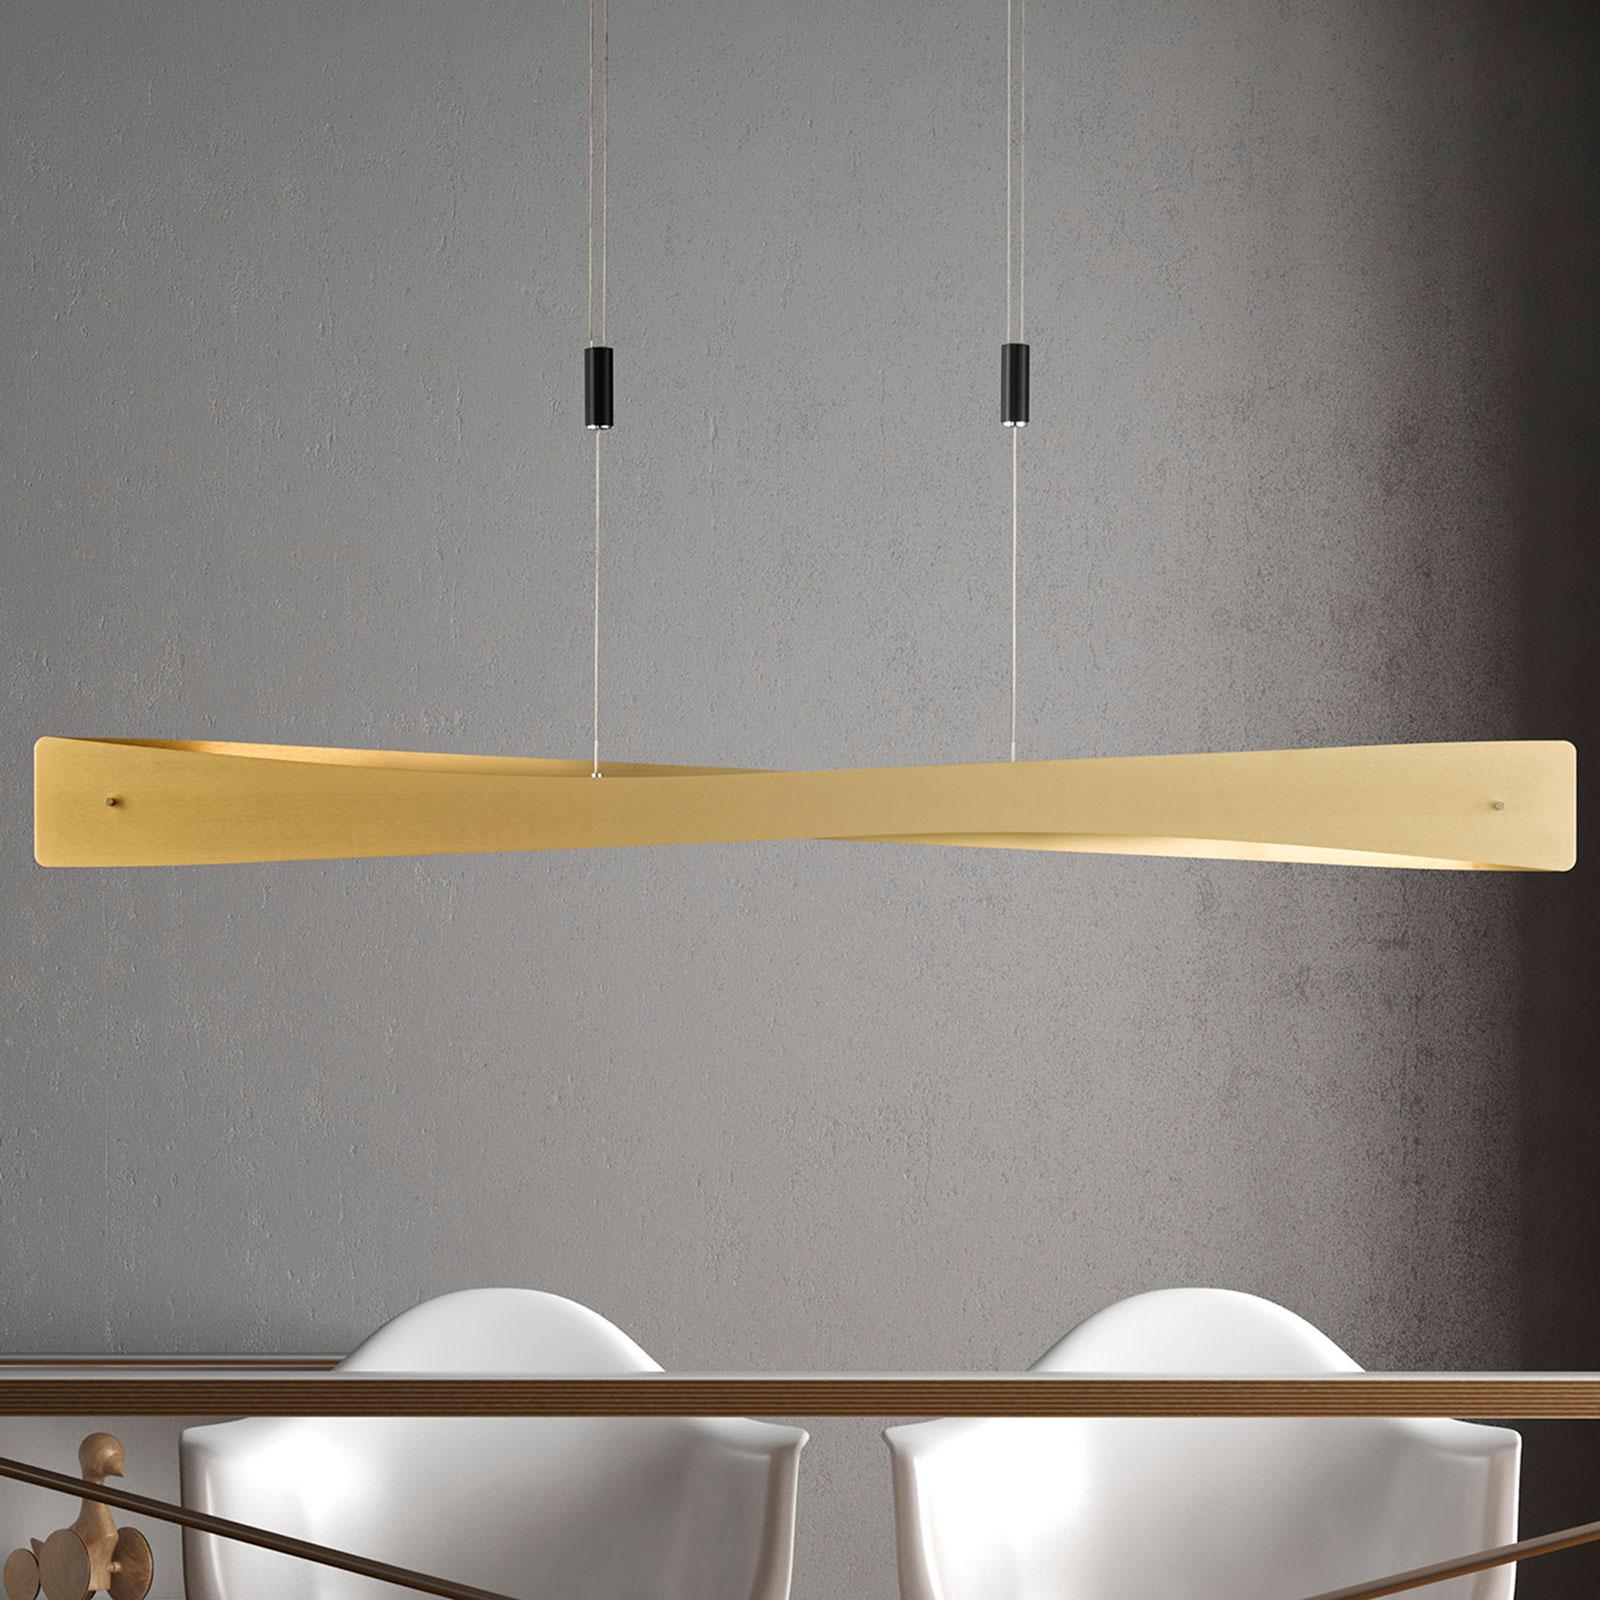 Lucande Lian lampa wisząca LED, mosiądz, czarna